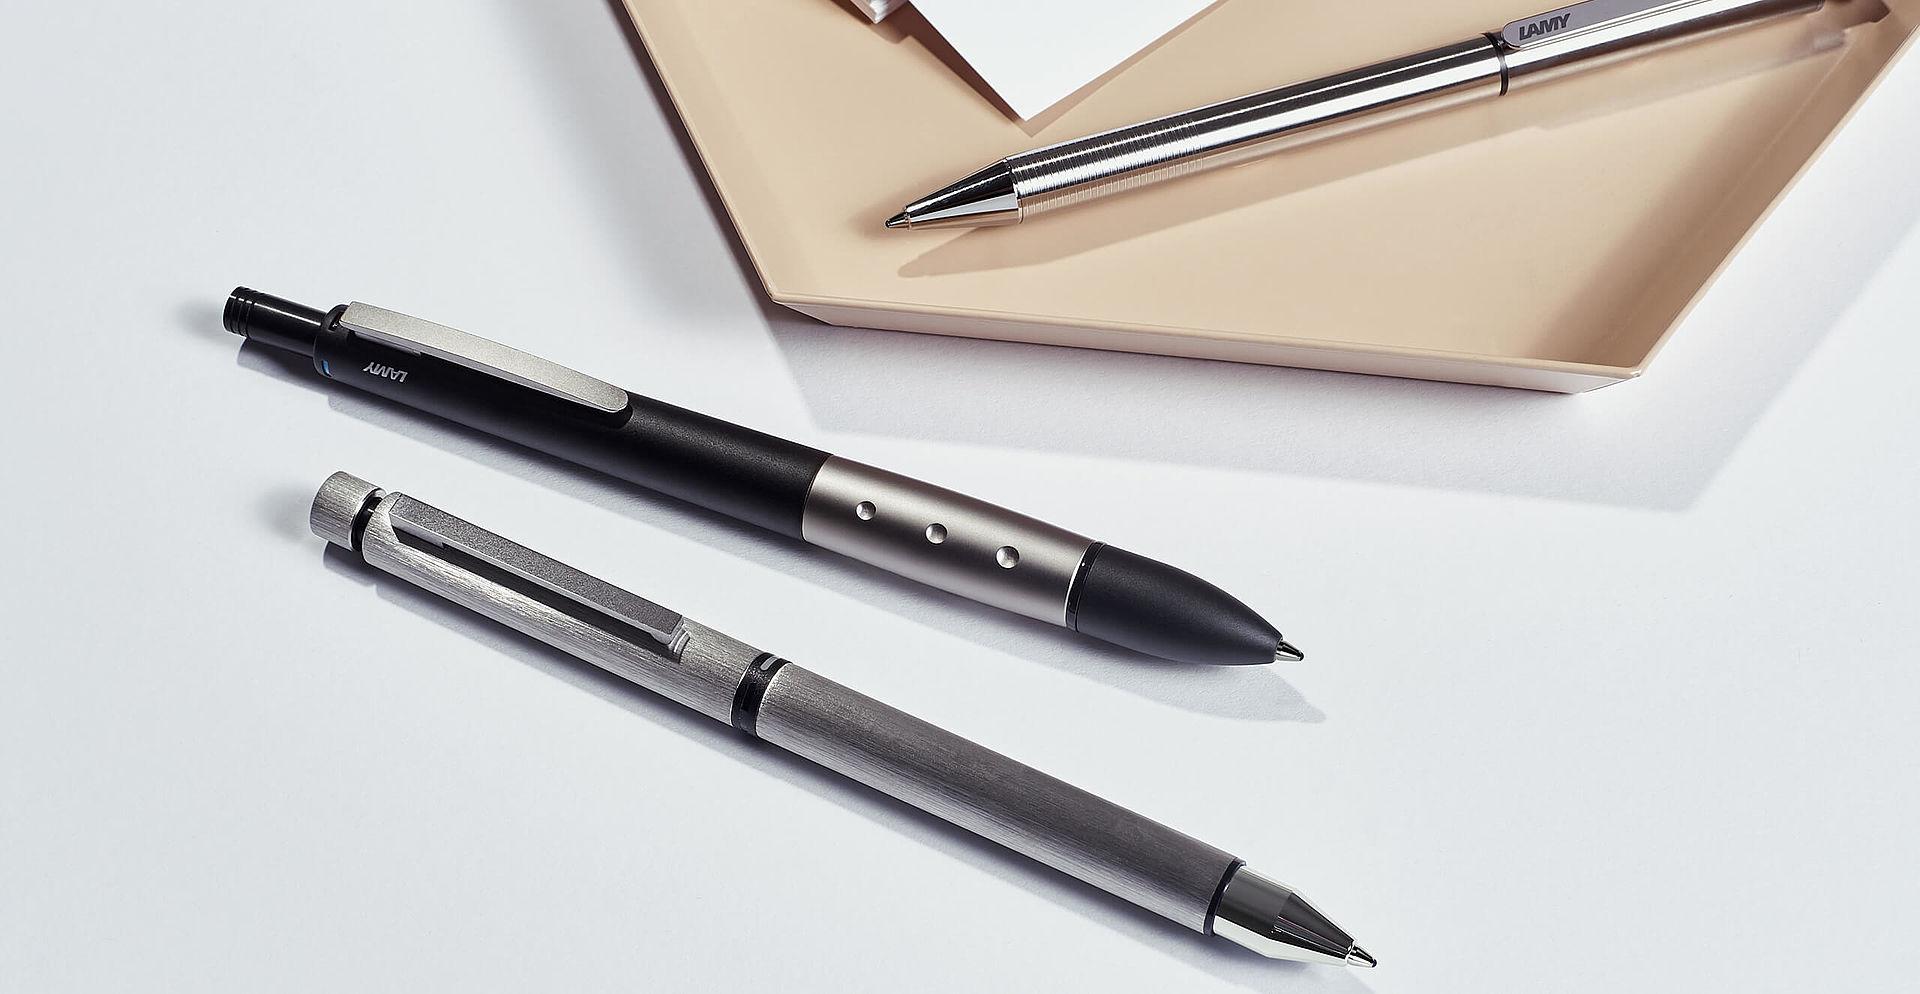 lamy Multisystem pens